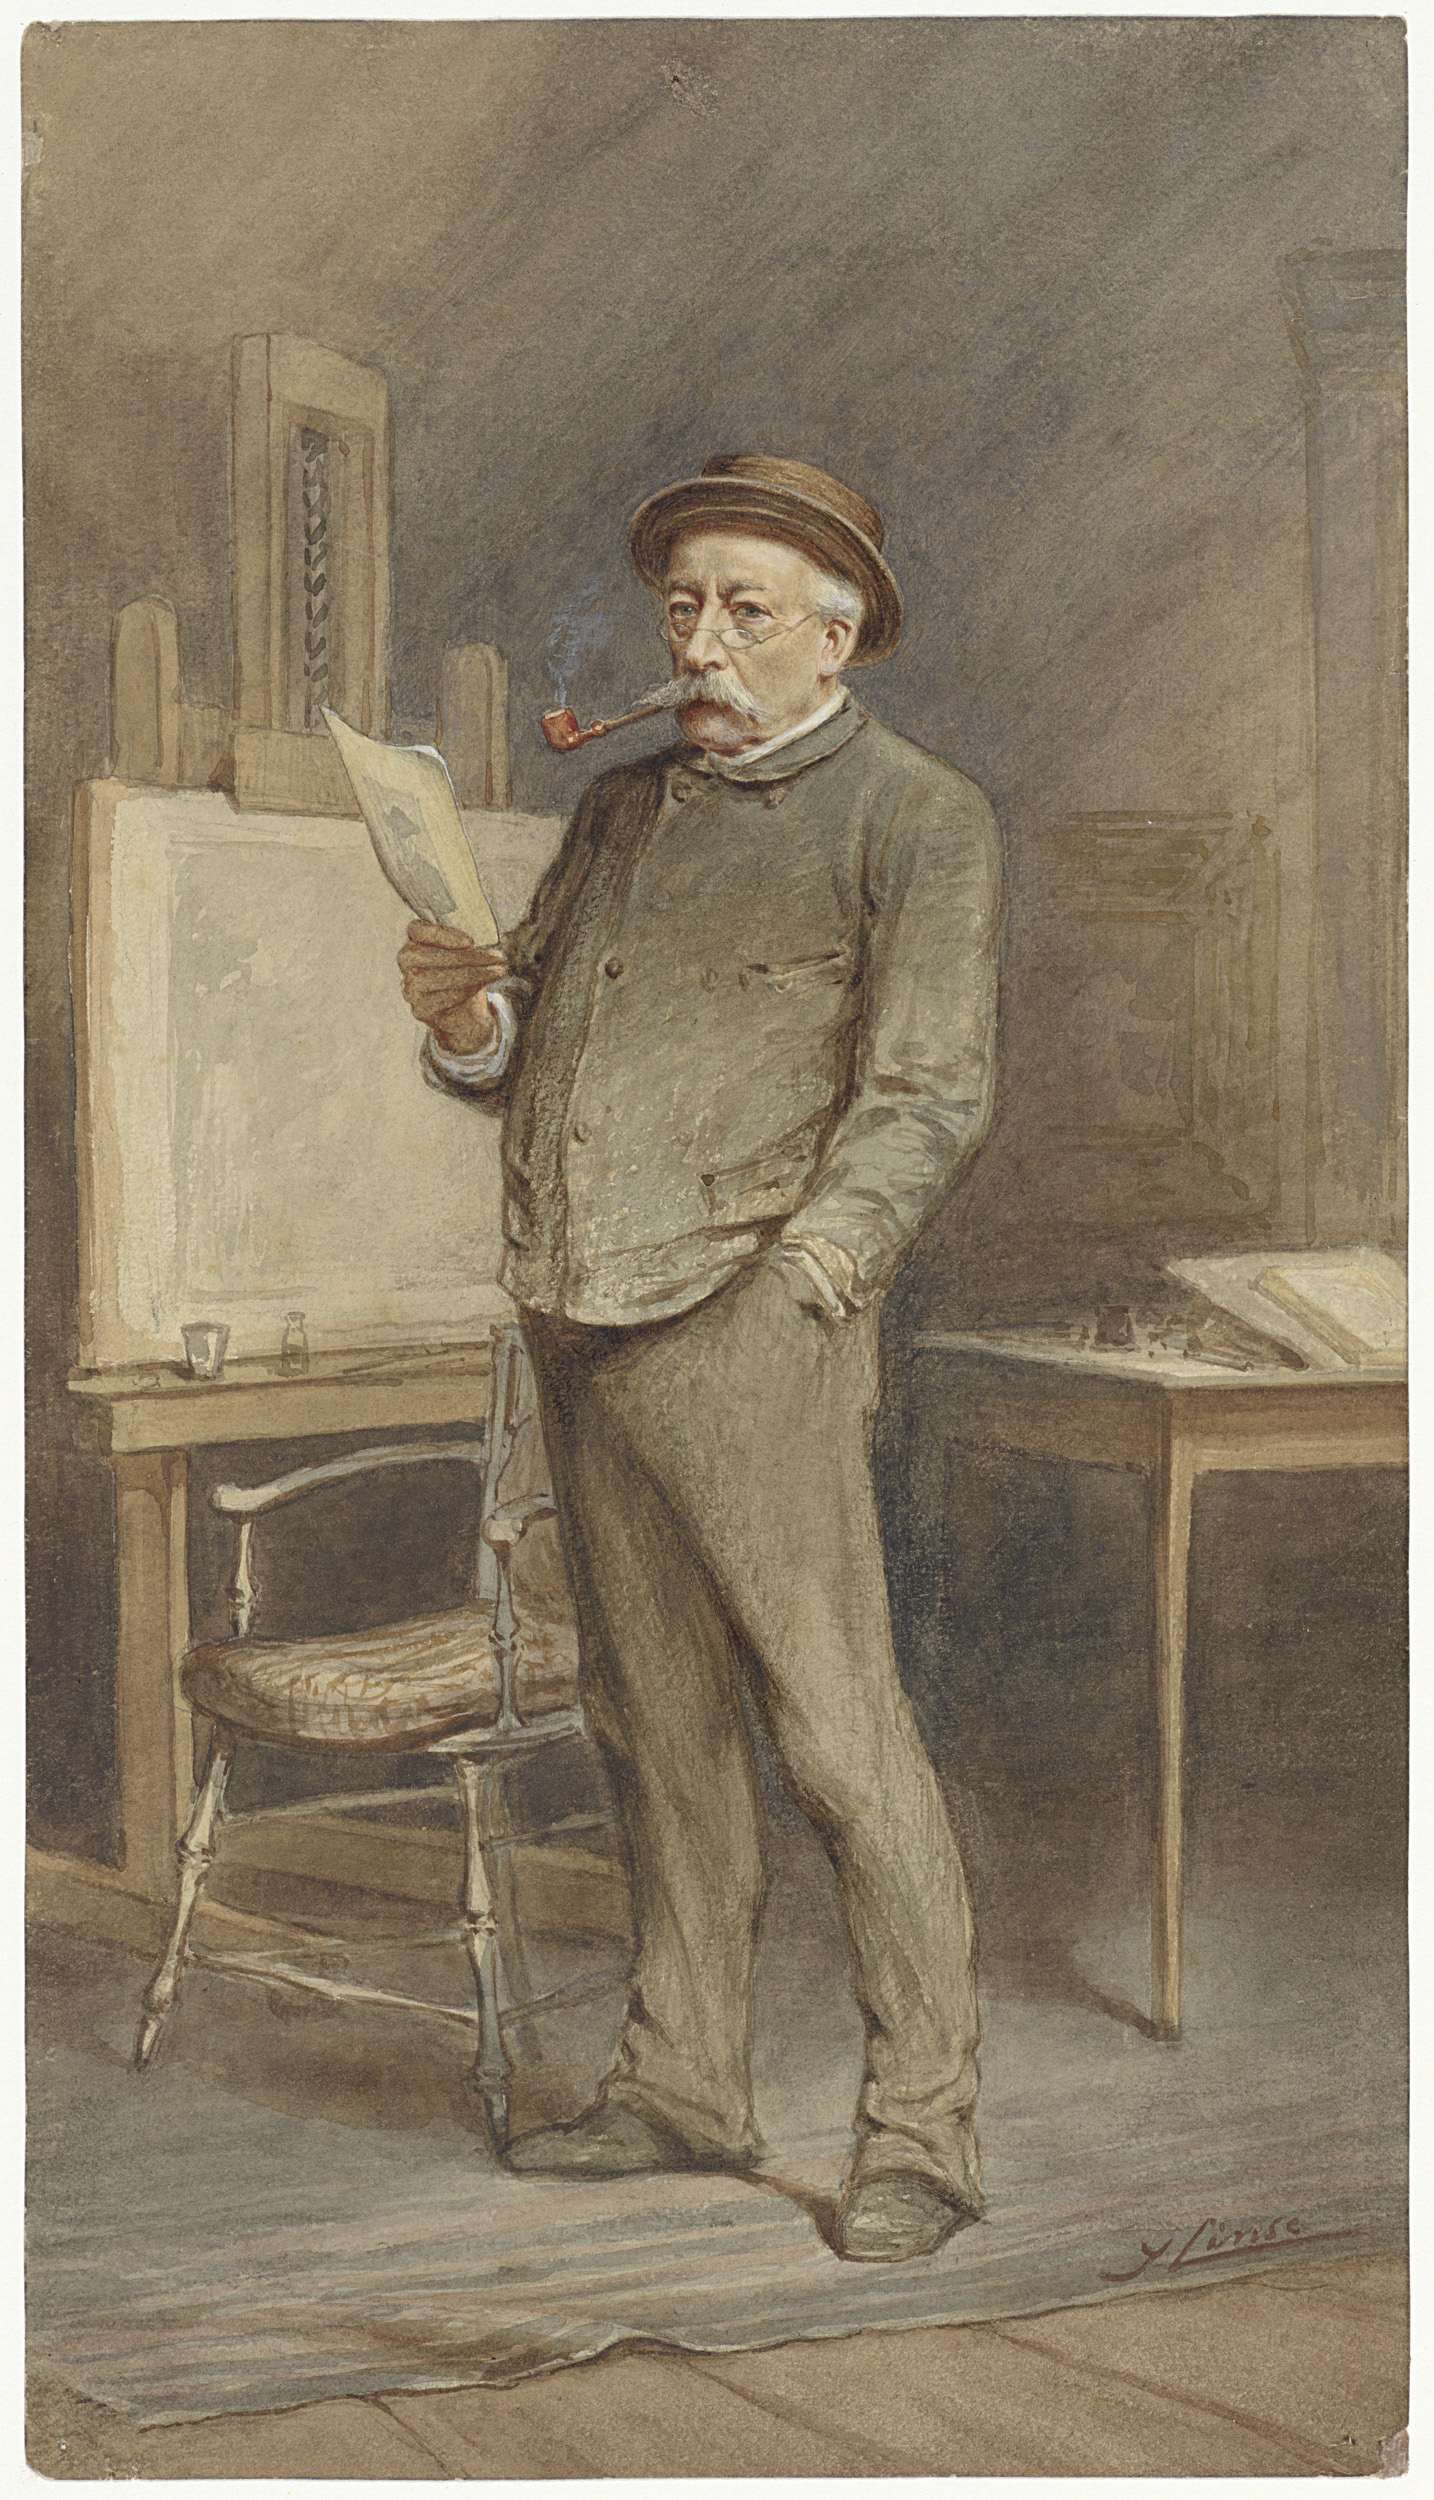 Hendrik Jan Carel Linse   Portret van Charles Rochussen in zijn atelier, Hendrik Jan Carel Linse, 1879   Portret van de kunstenaar Charles Rochussen in zijn atelier.